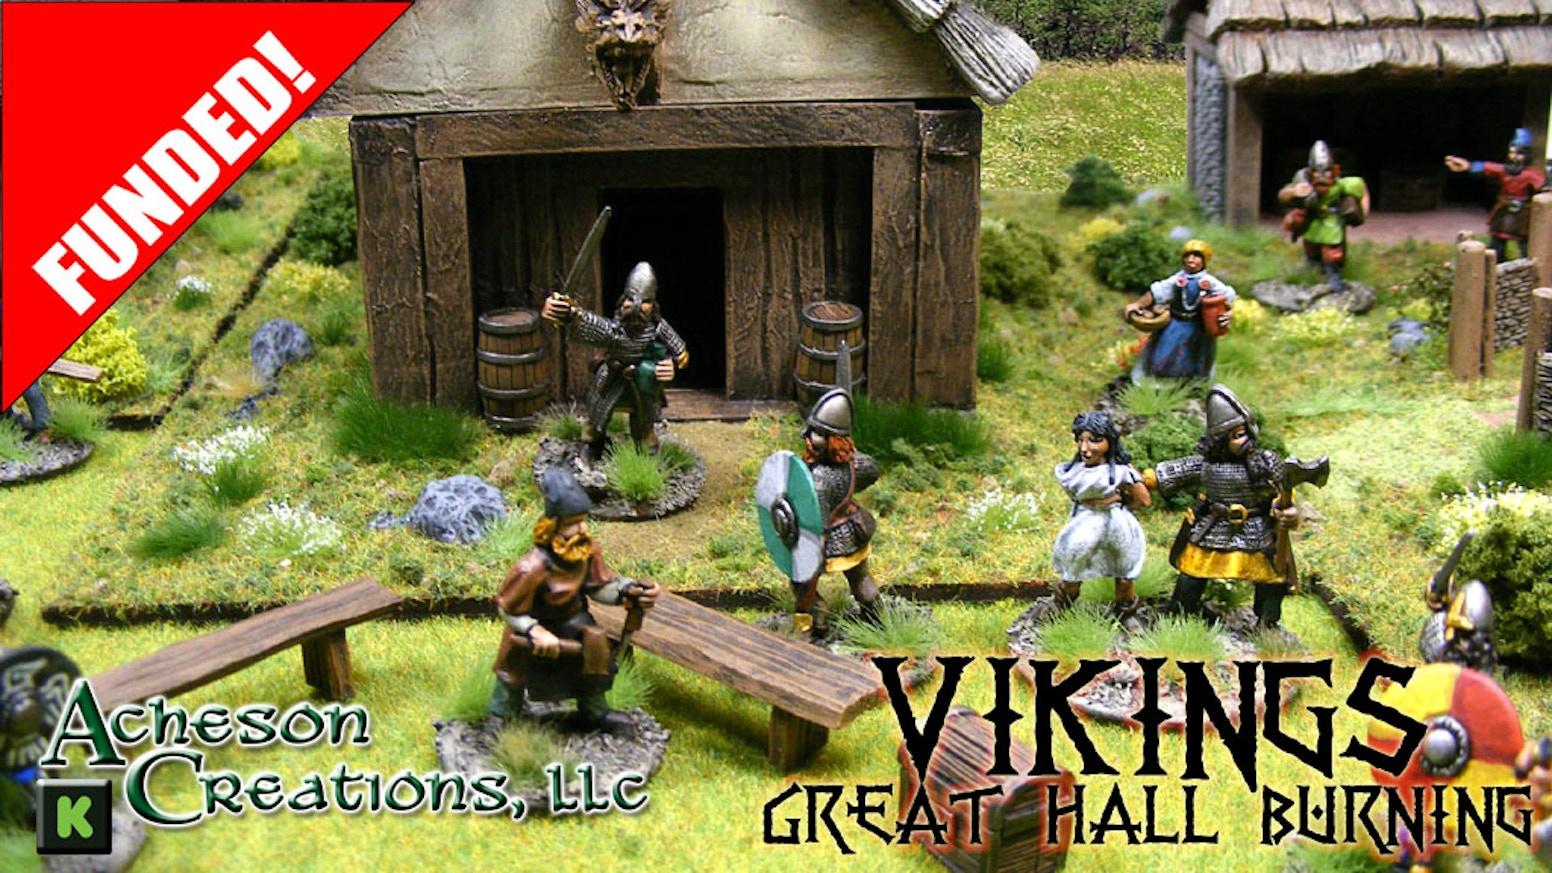 Metal Carport Creations : Vikings great hall burning mm tabletop wargaming by